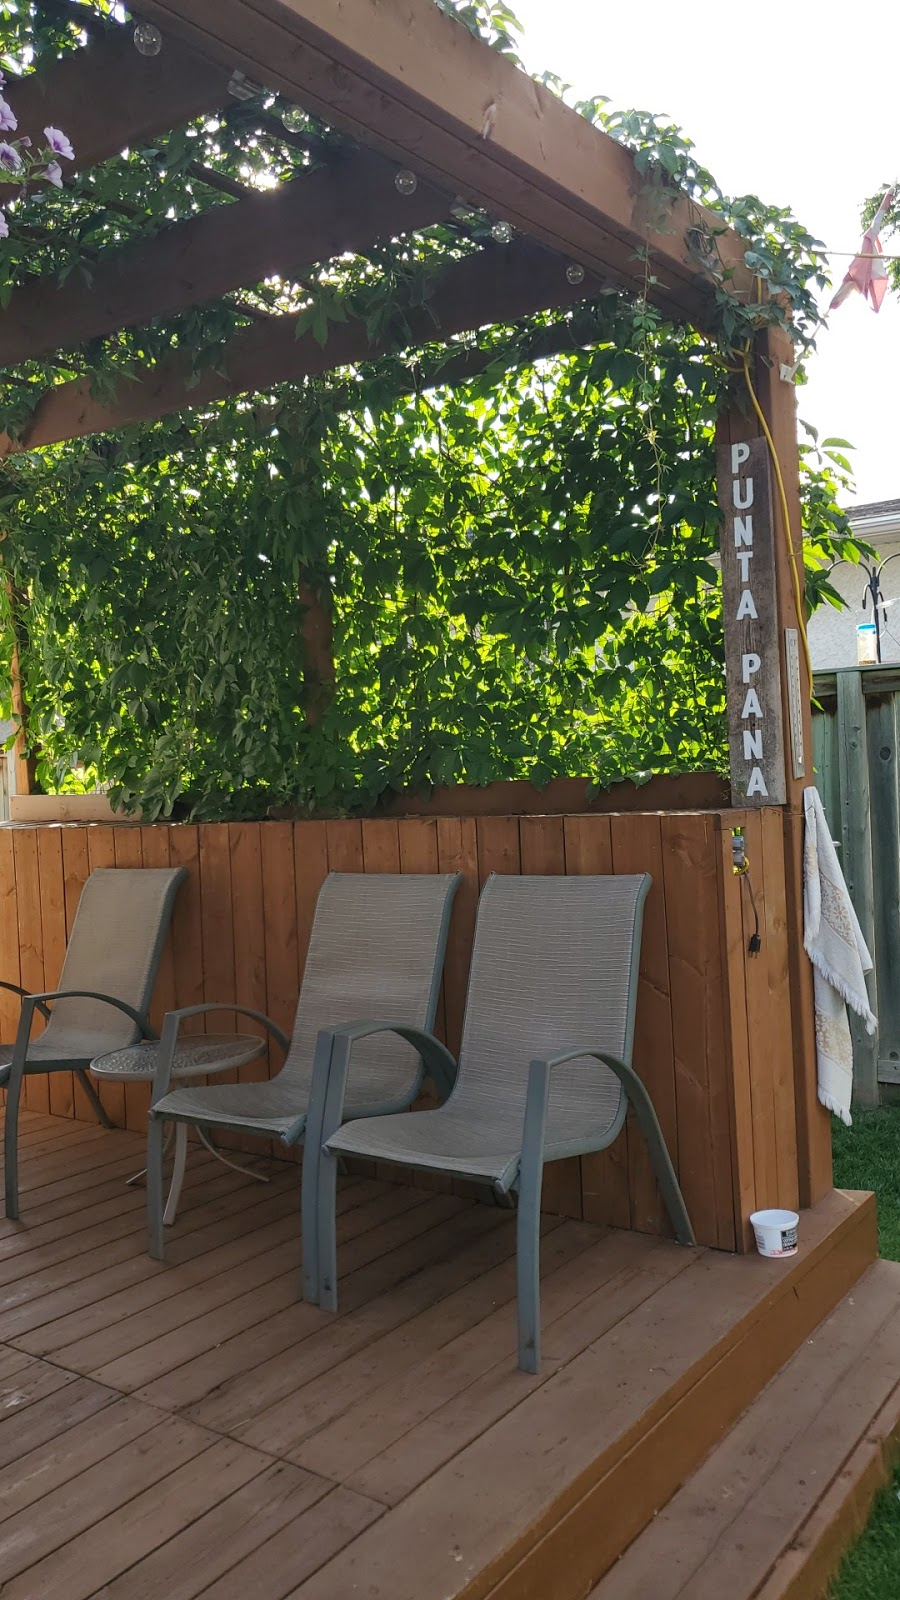 Punta Pana Backyard Bar & Grill | restaurant | 583 Glenway Ave, East Saint Paul, MB R2G 1H8, Canada | 2046680144 OR +1 204-668-0144